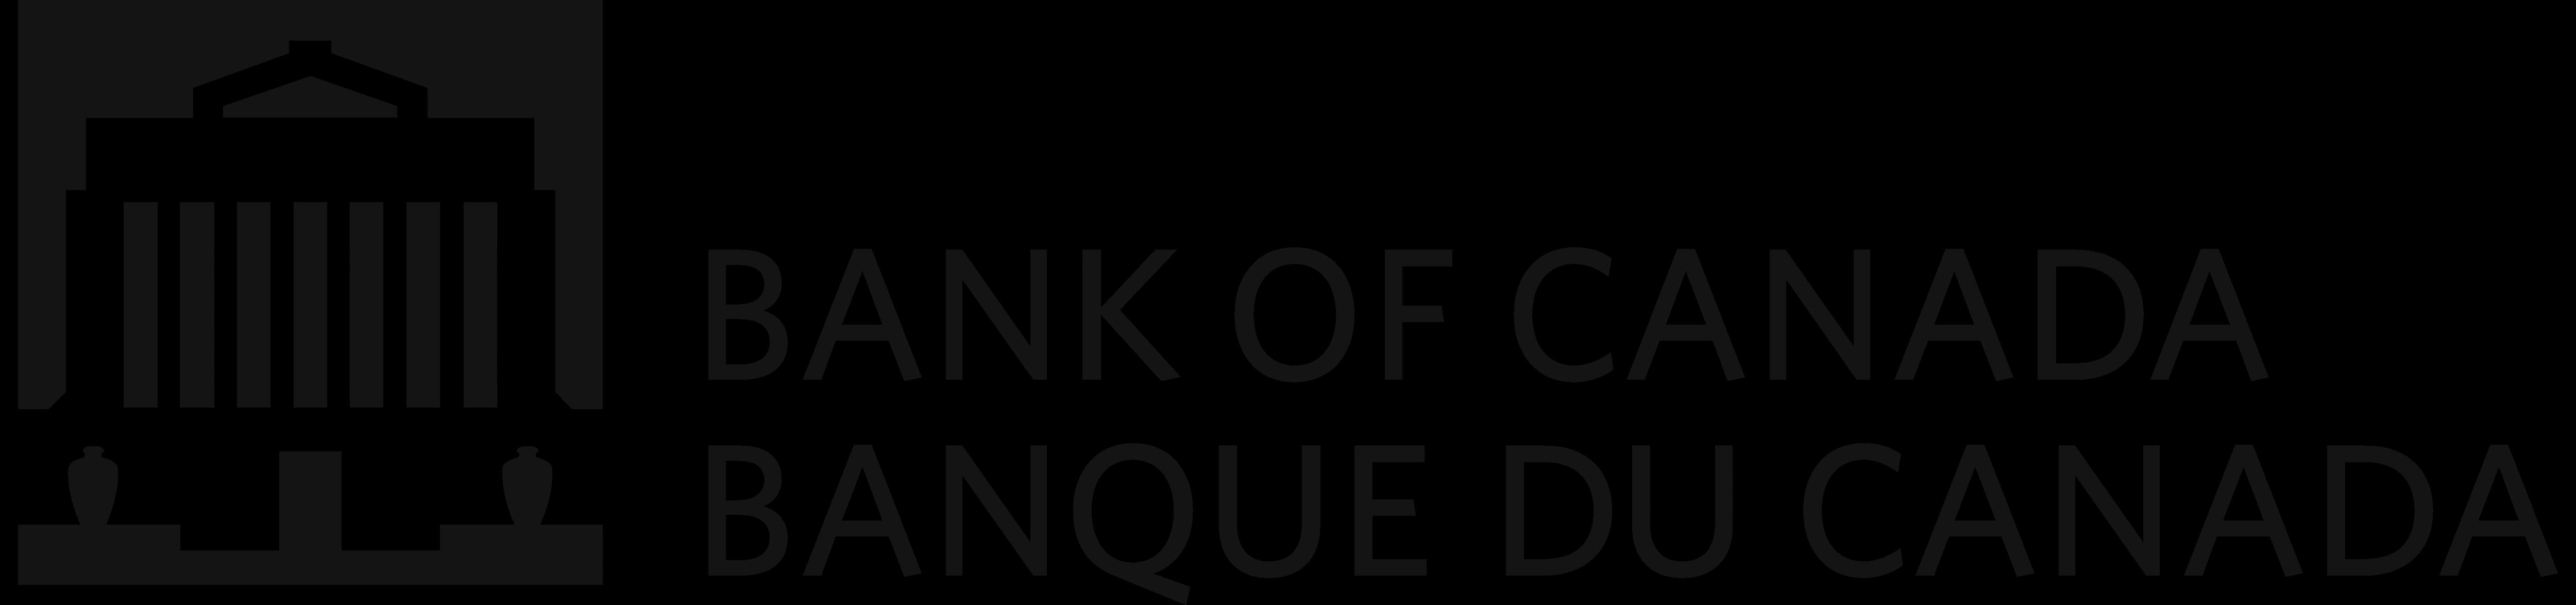 Bank_of_Canada_logo